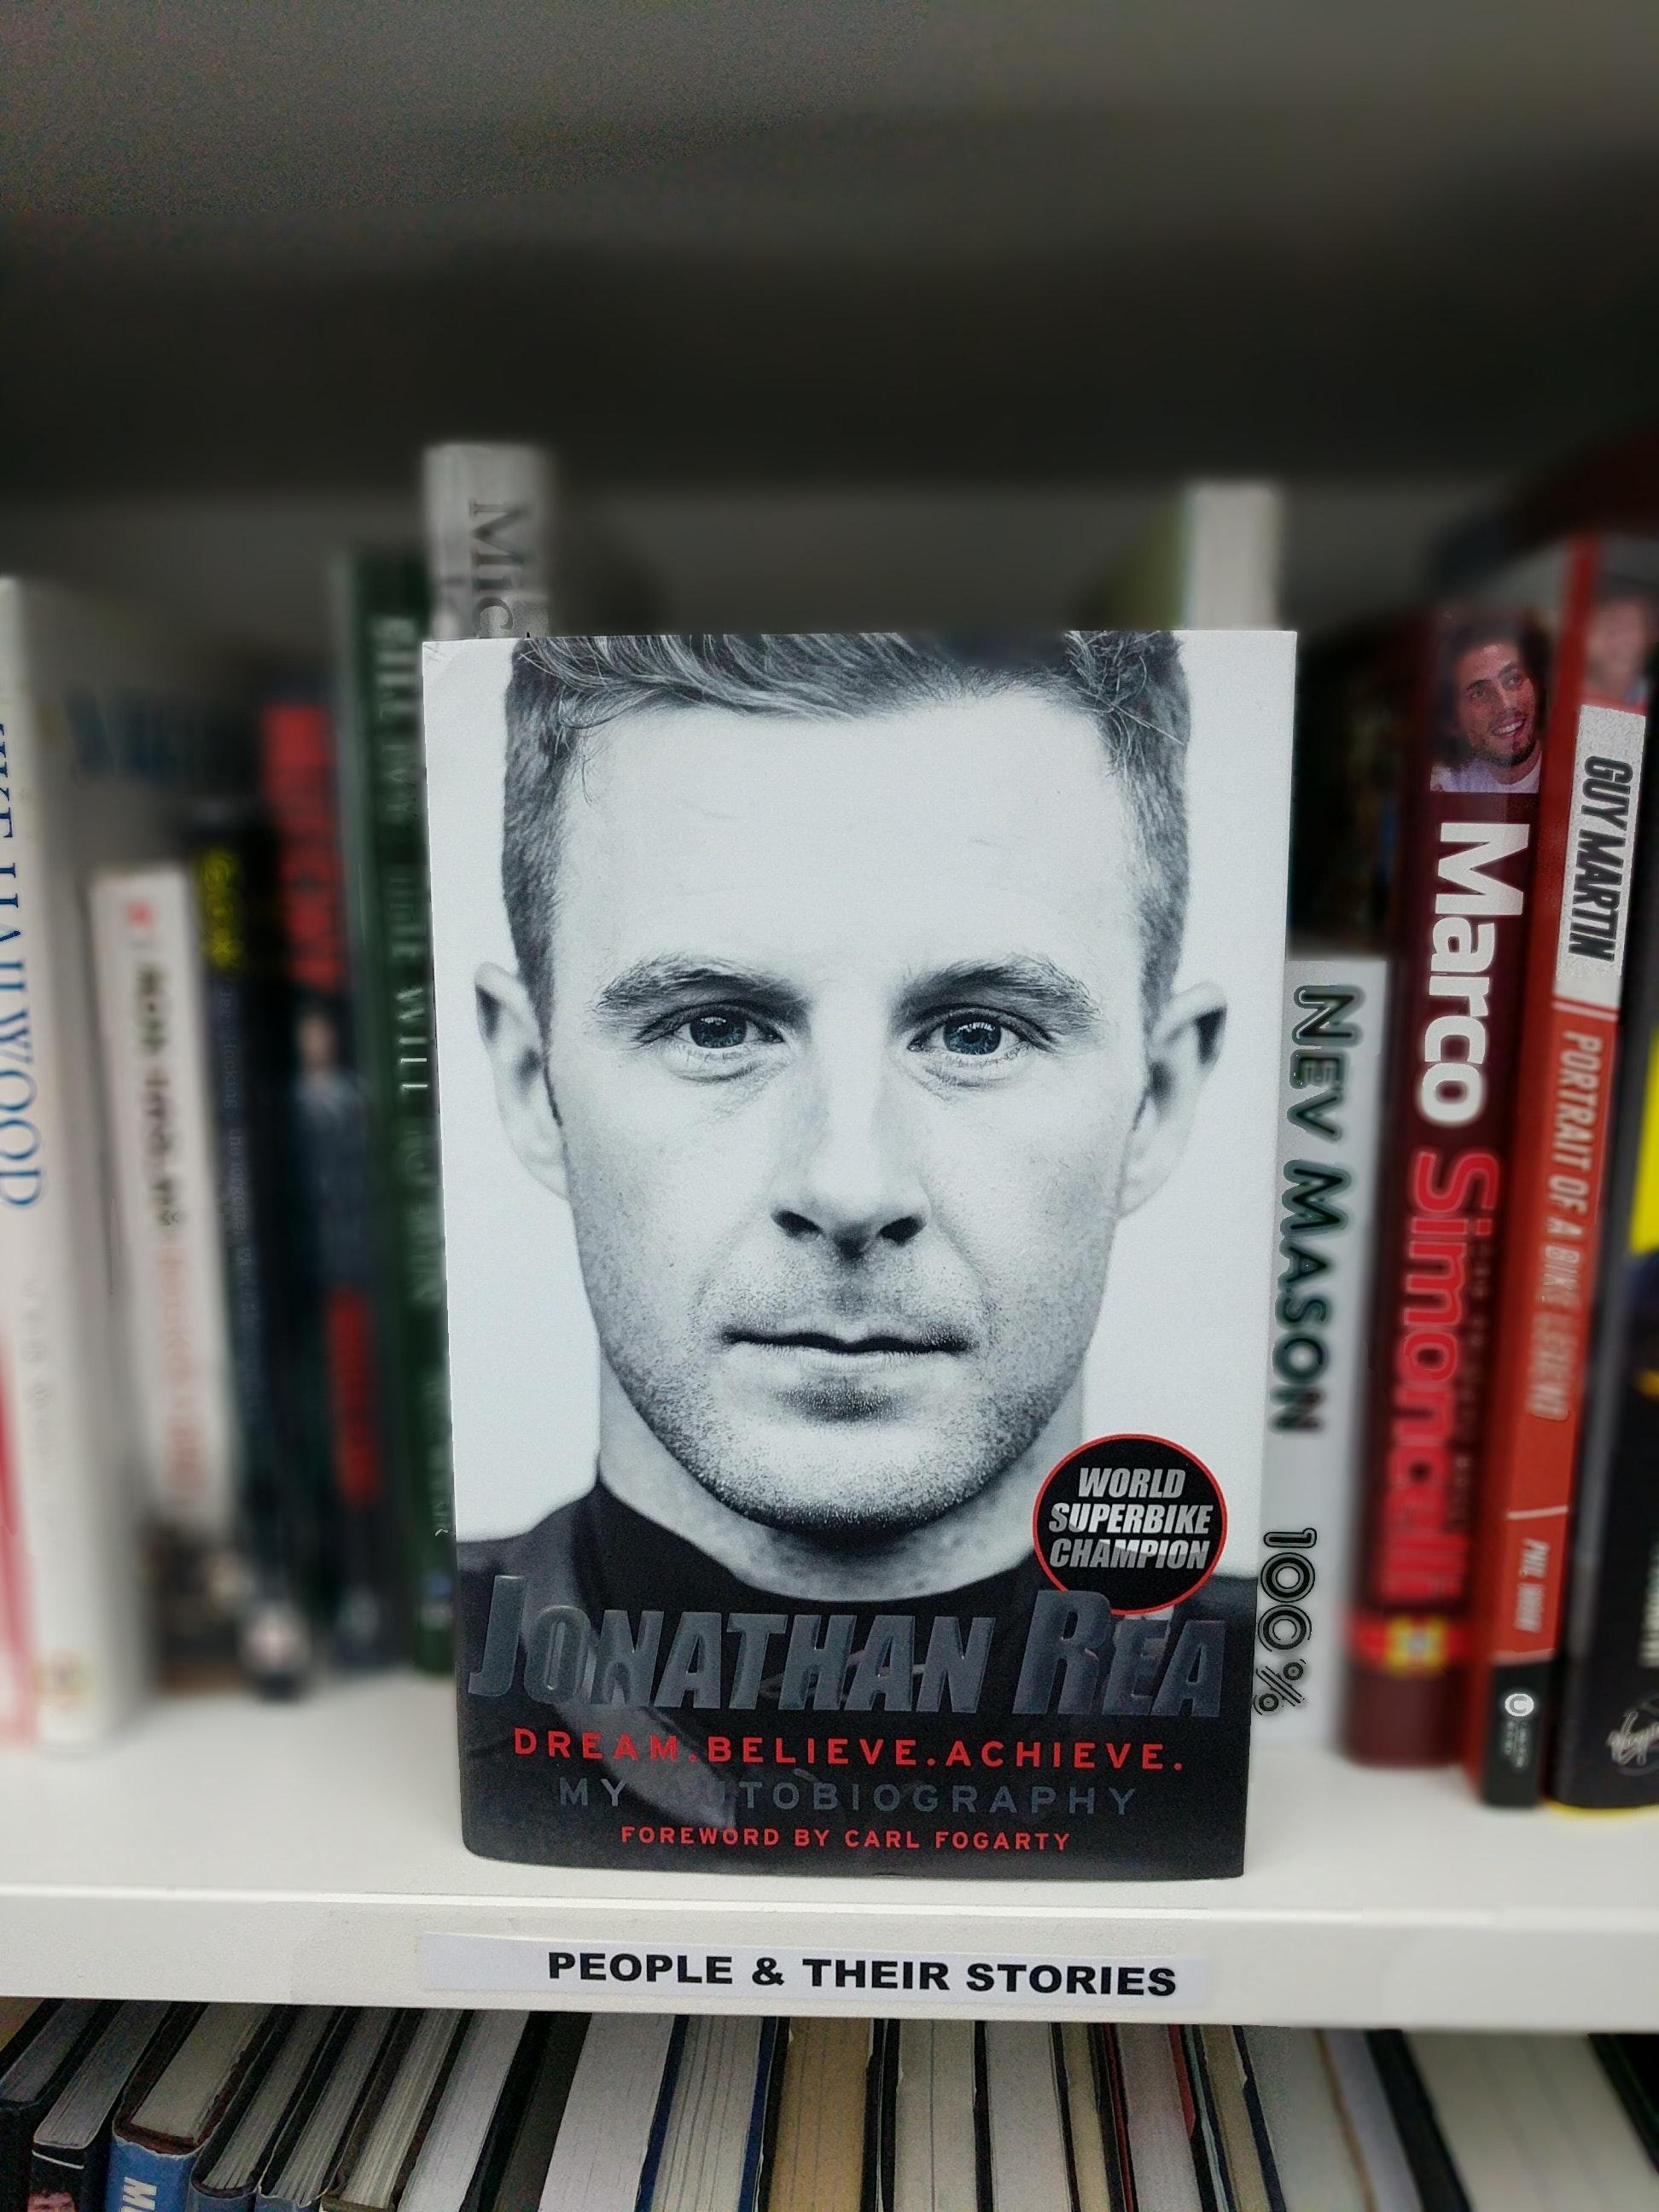 WSB Champ Jonathan Rea's Autobiography in hardback sweepstakes